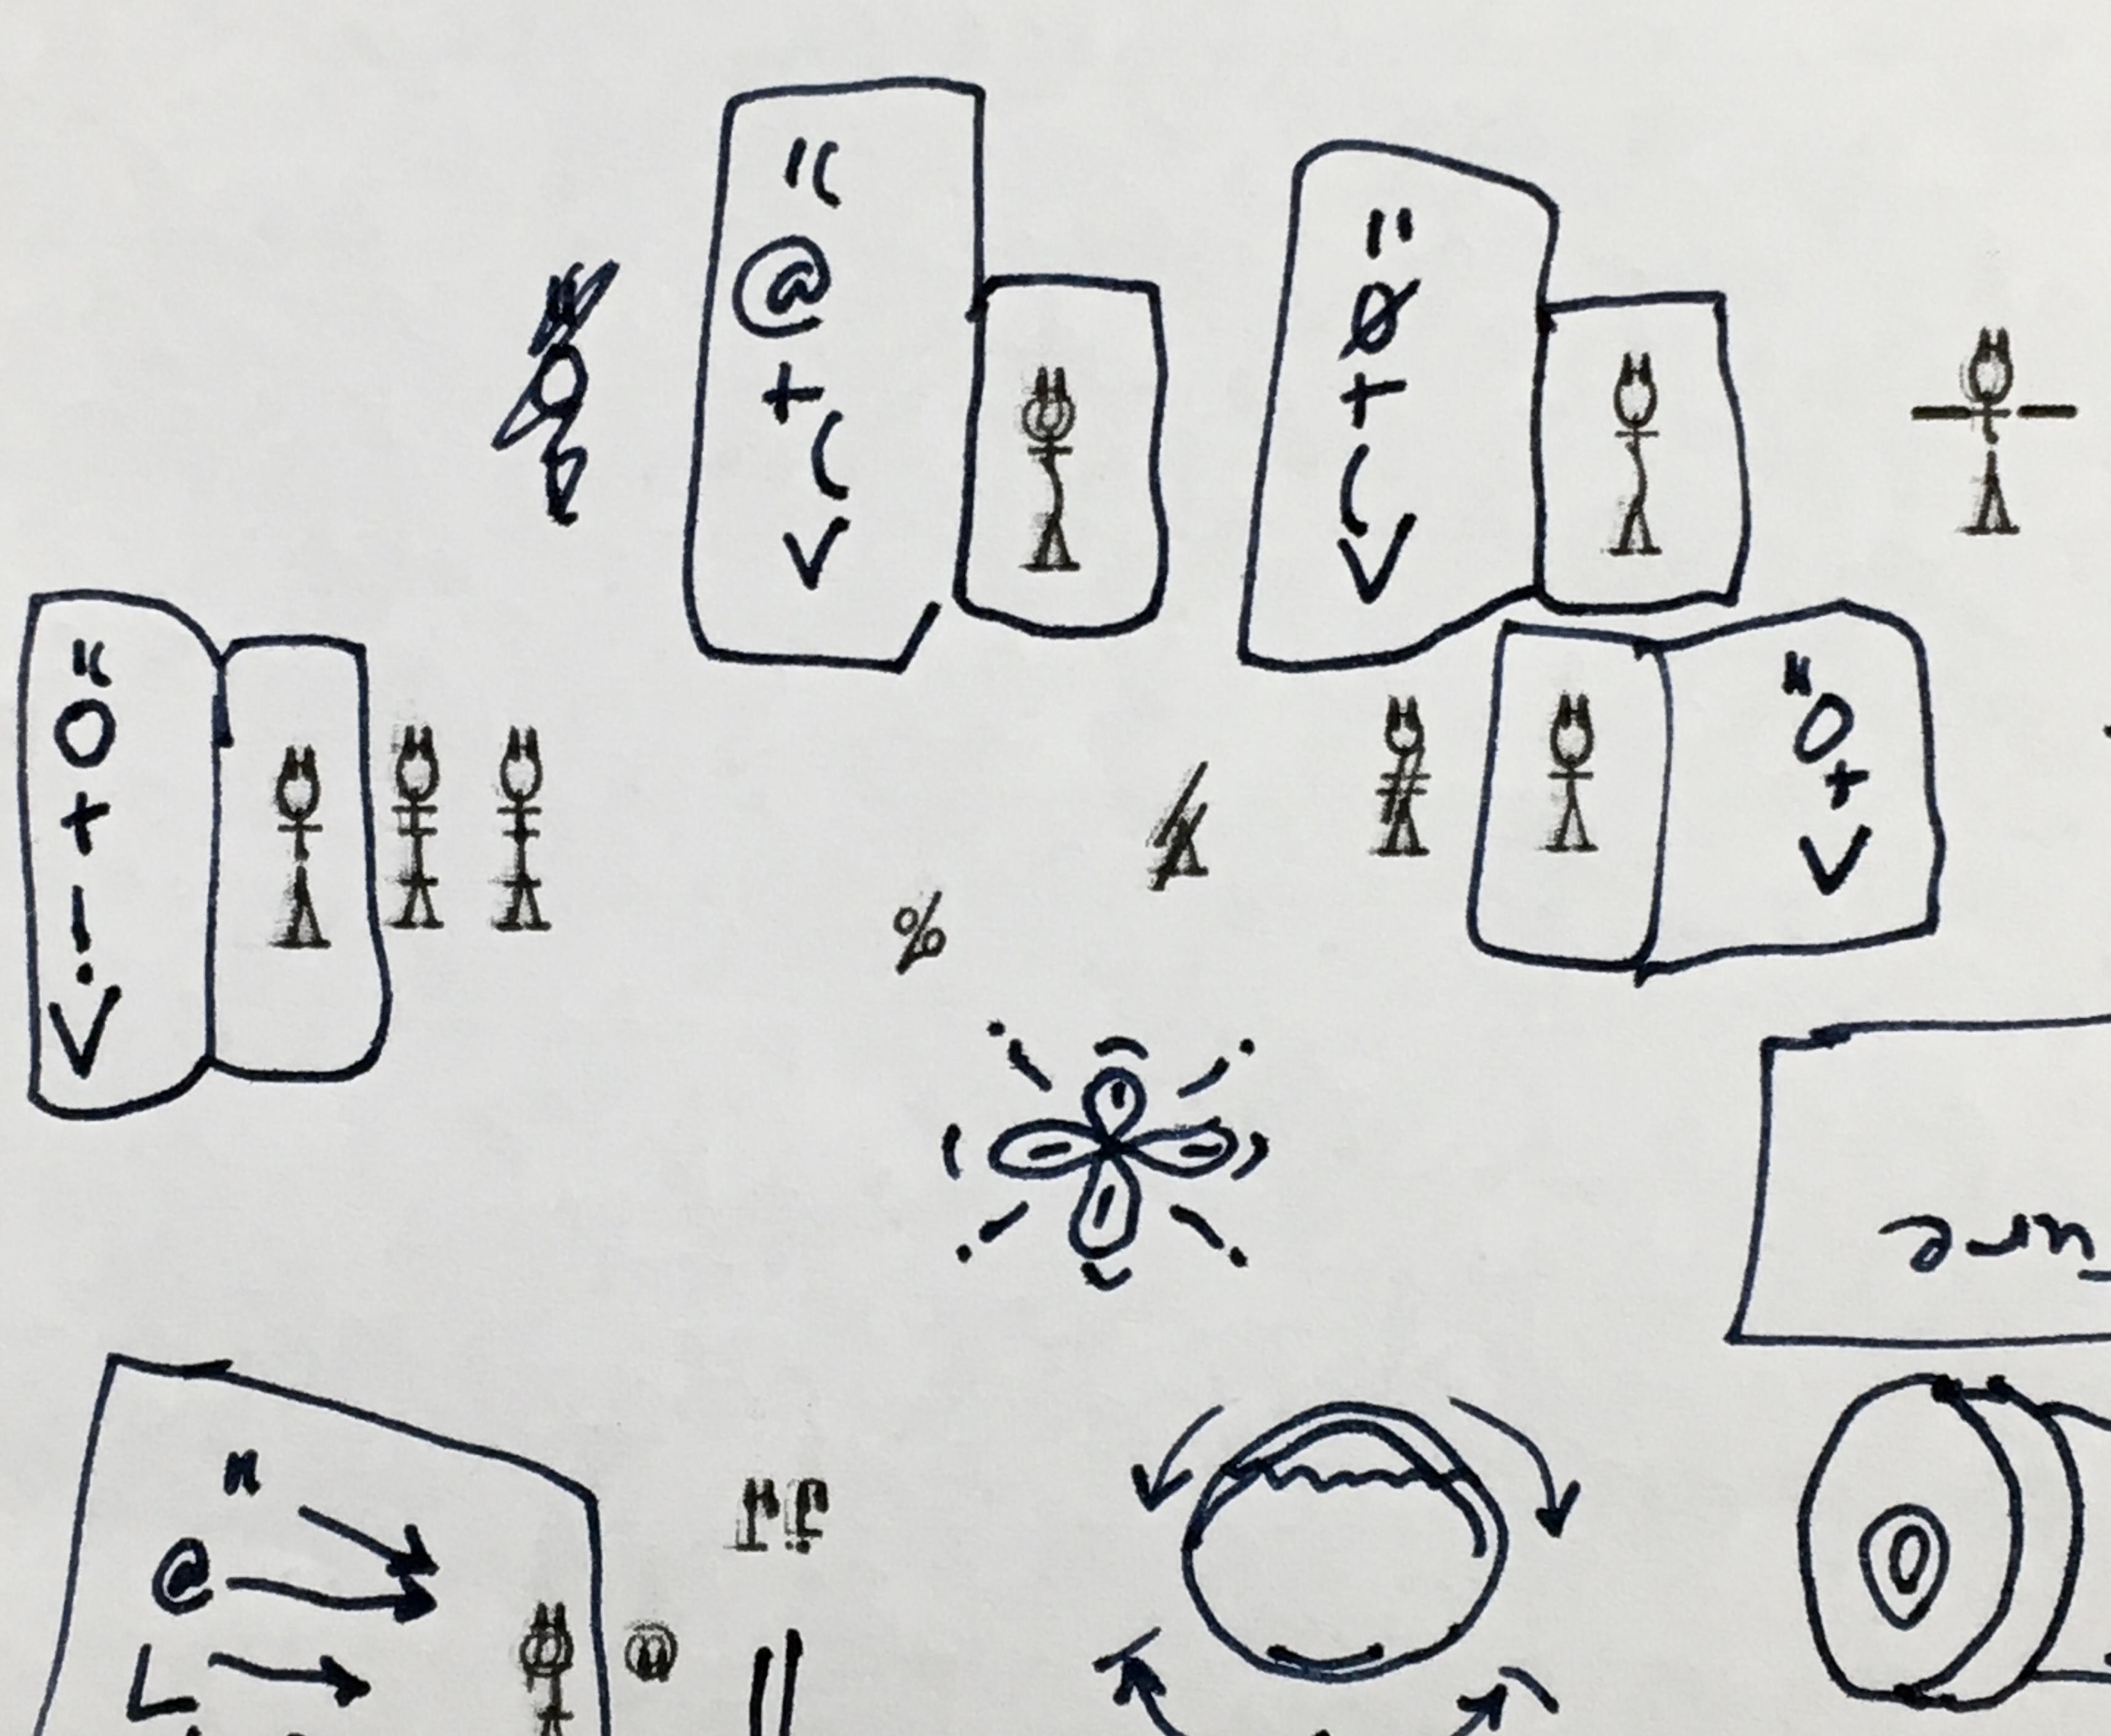 Typewritten Cartoon Characters